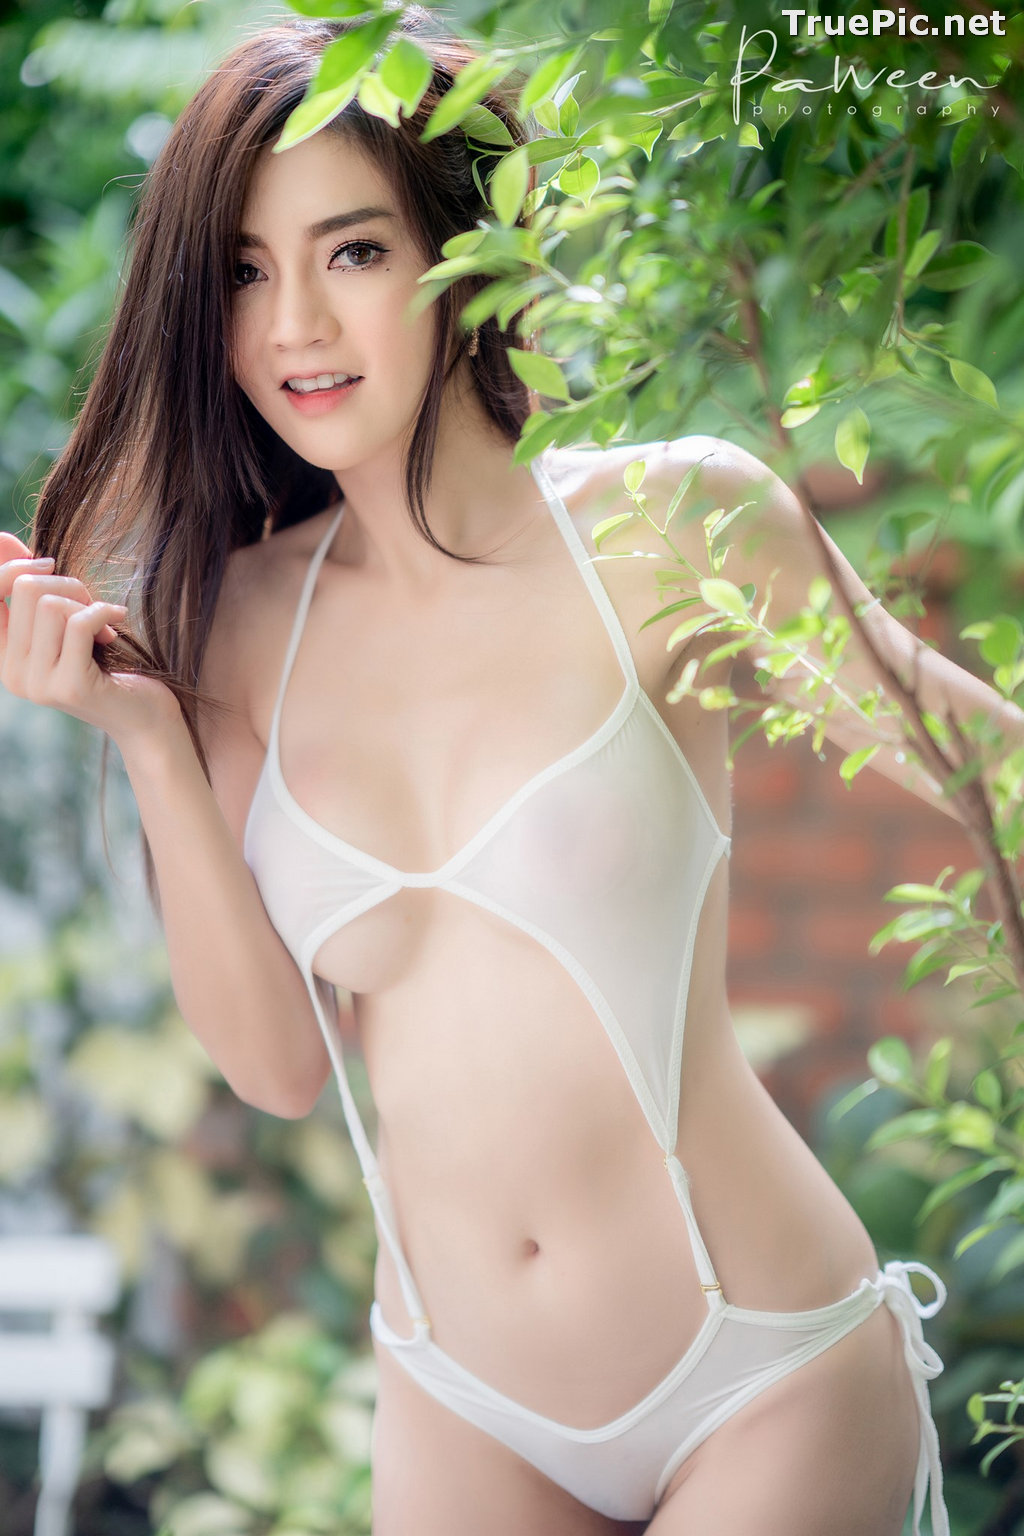 Image Thailand Model - Ladapa Ratchataamonchot - Sexy Garden - TruePic.net - Picture-1